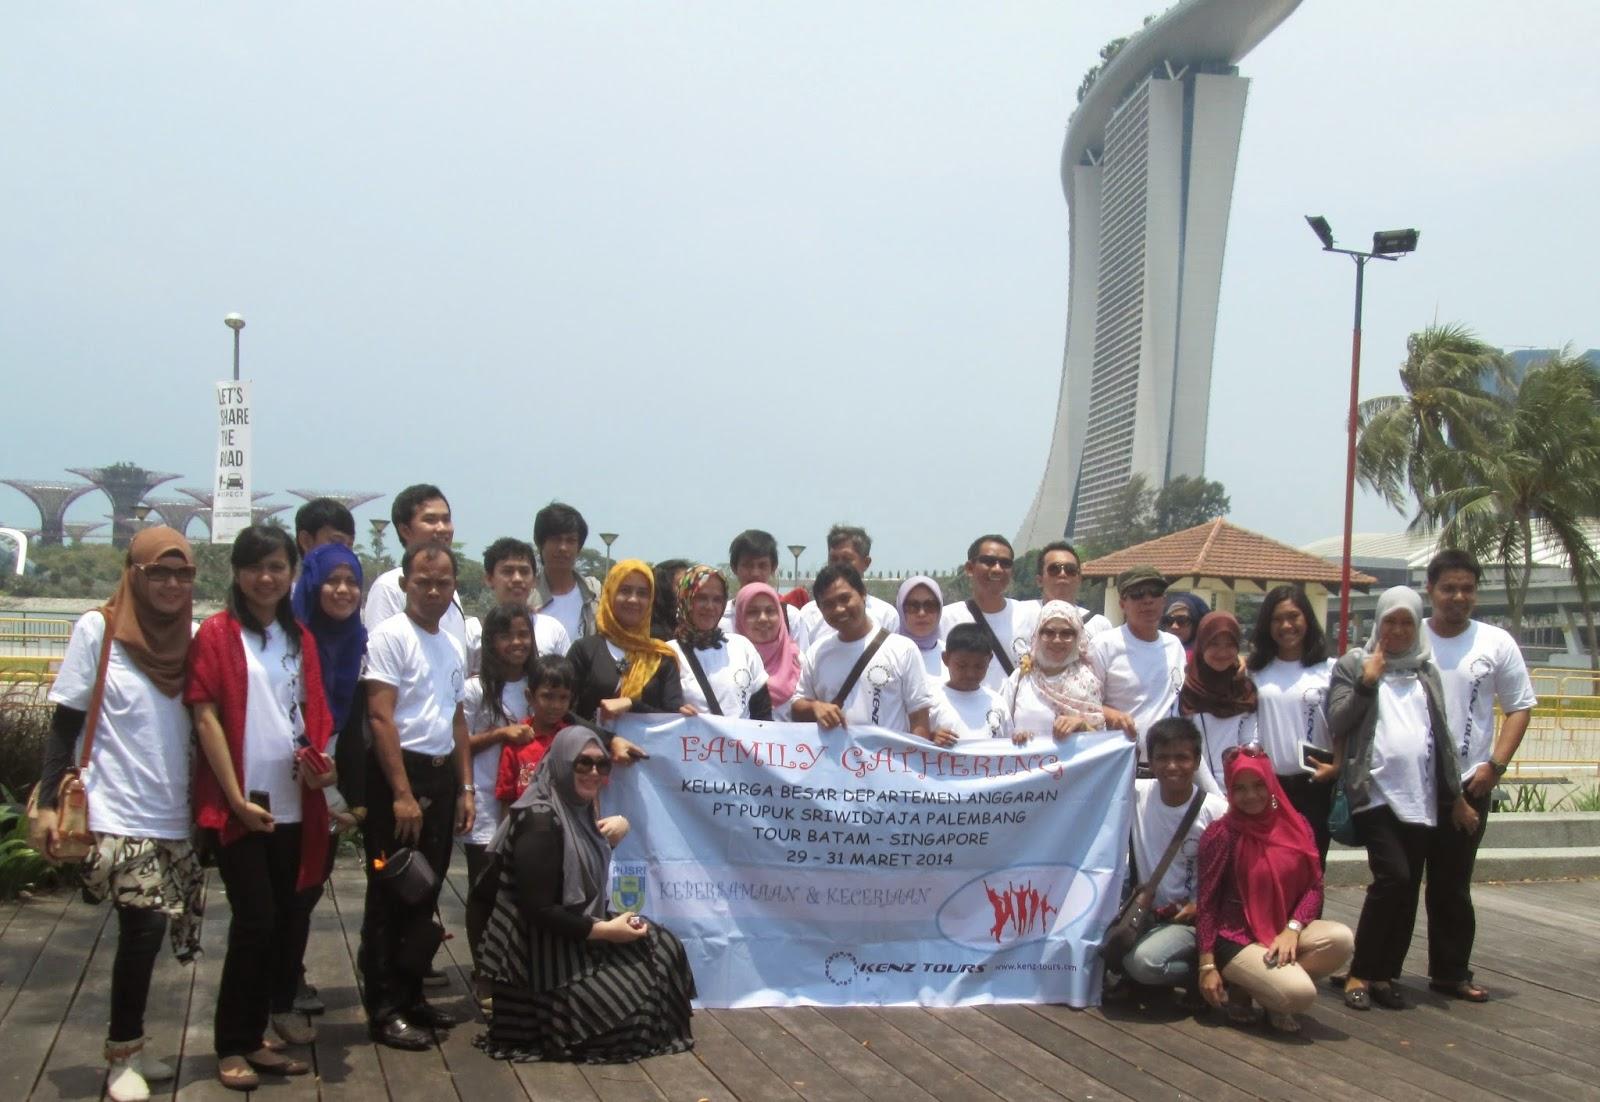 Paket Wisata Tour Thailand Malaysia Singapura Murah